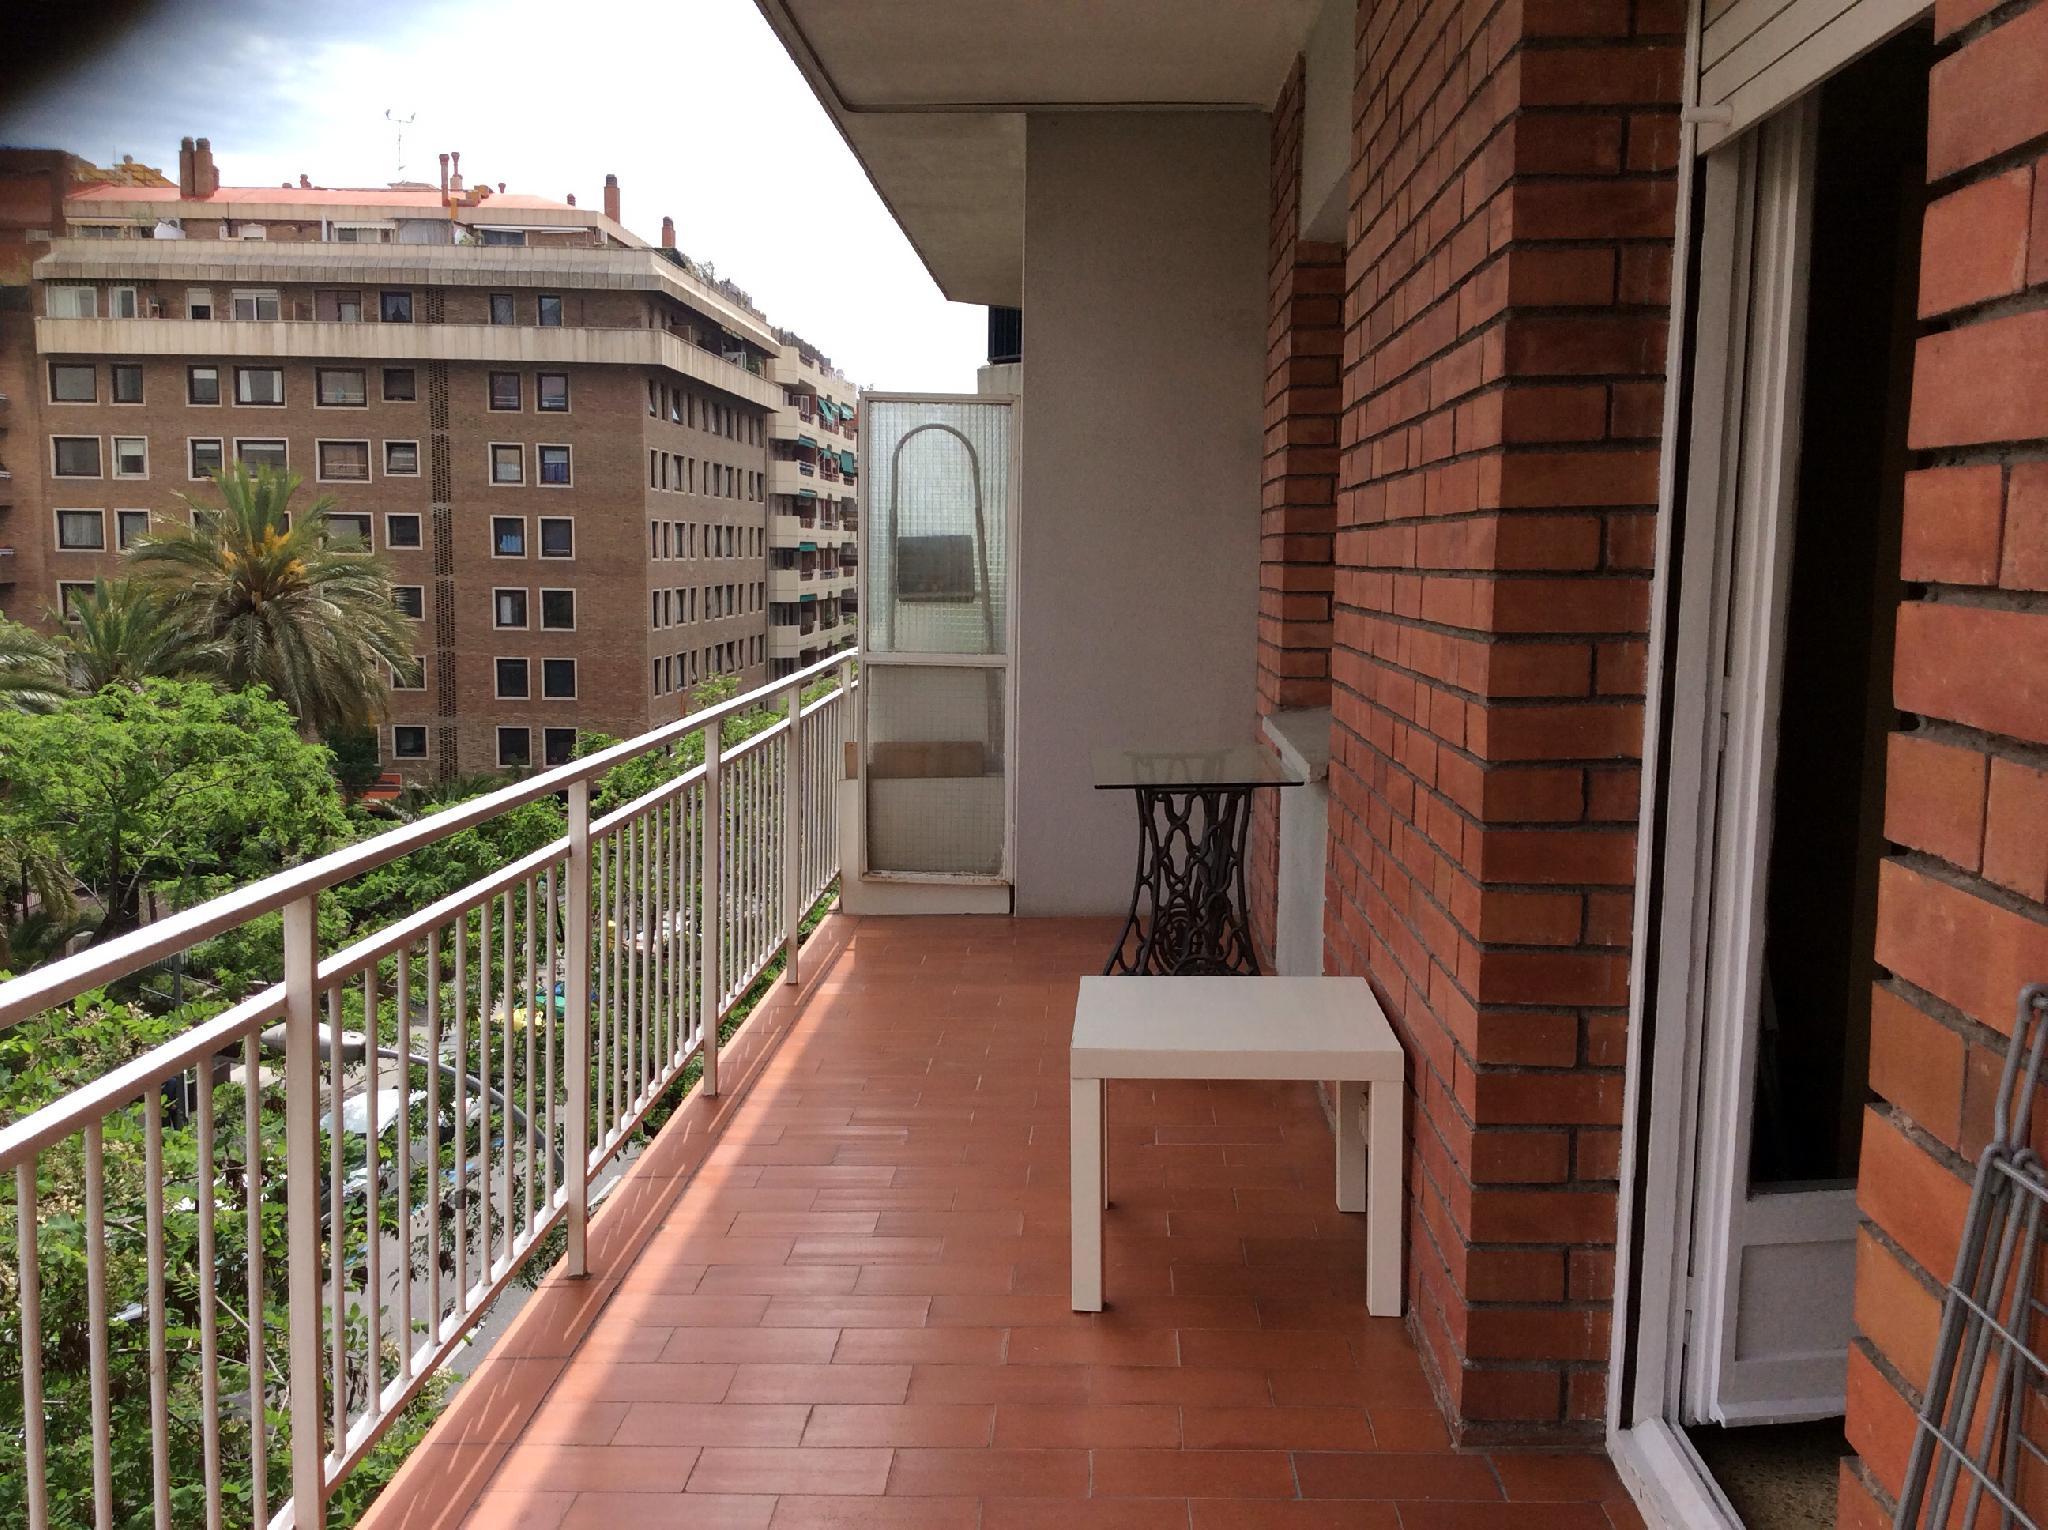 petit-appartement-de-vente-a-junto-placa-joanic-y-calle-escorial-gracia-nova-a-barcelona-206479924